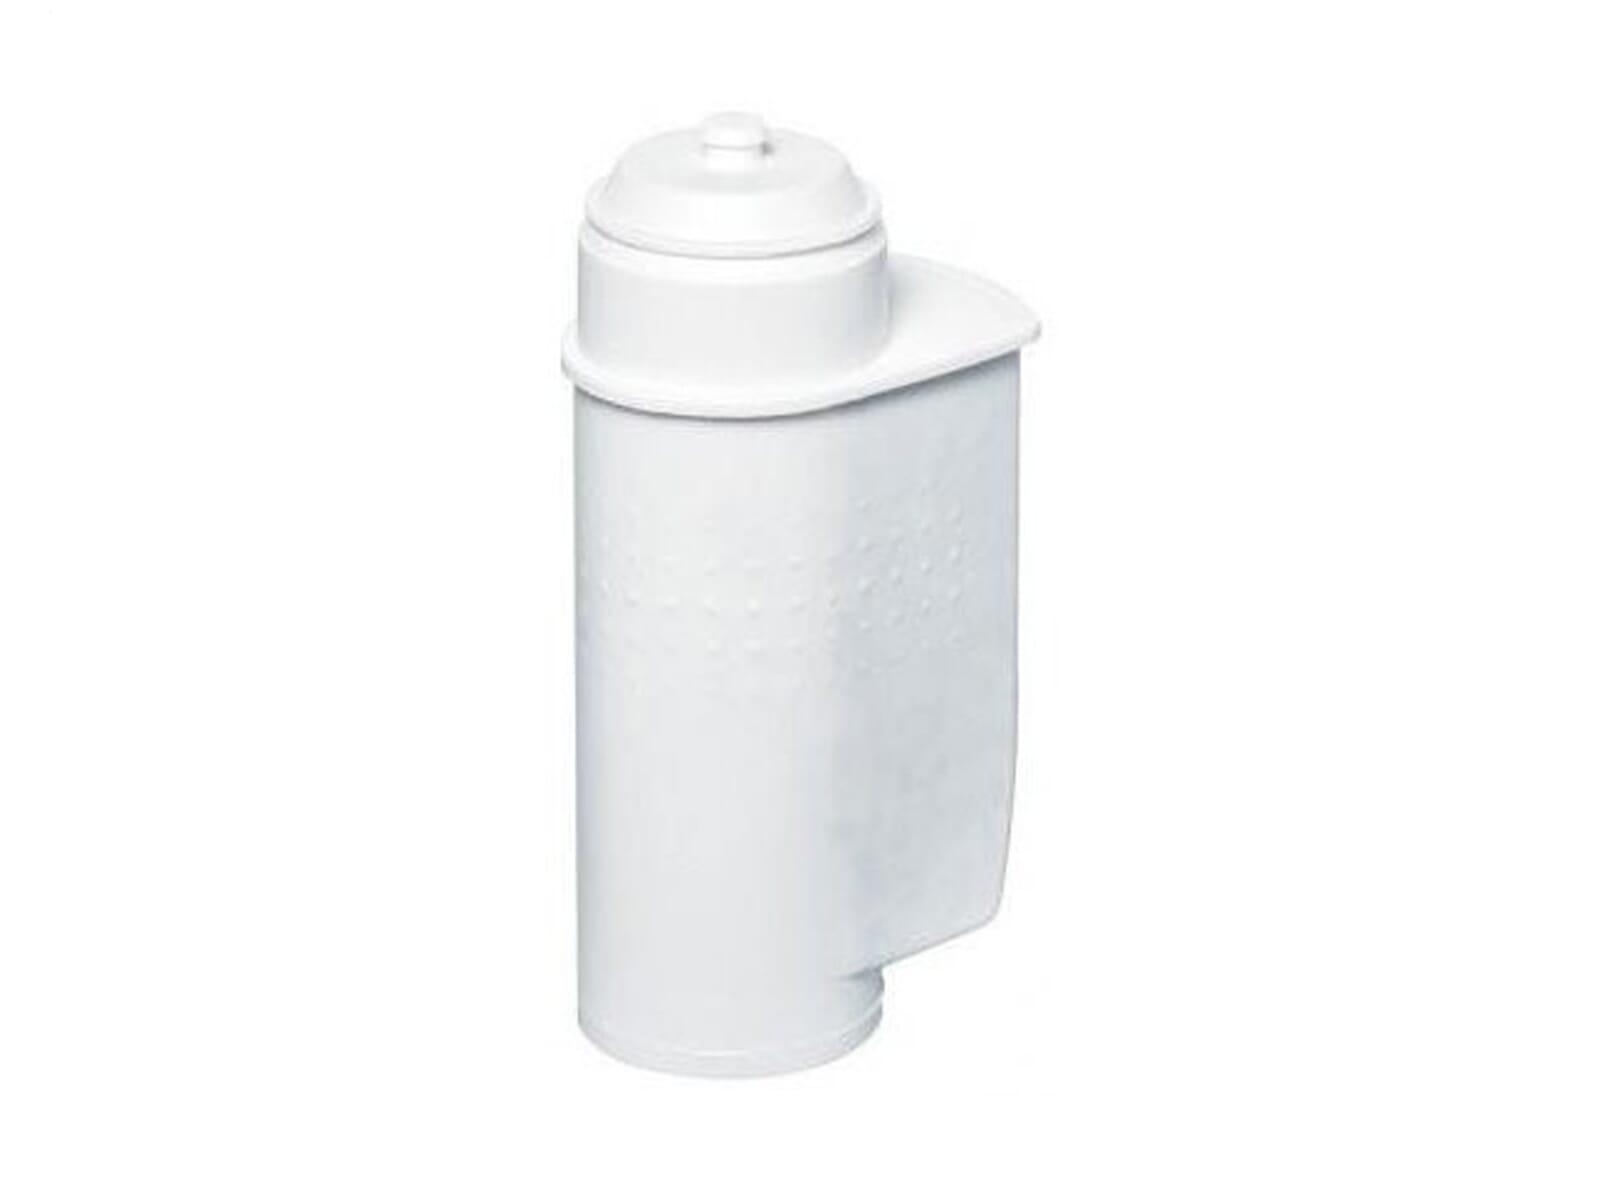 Siemens FI50Z000 Wasserfilter